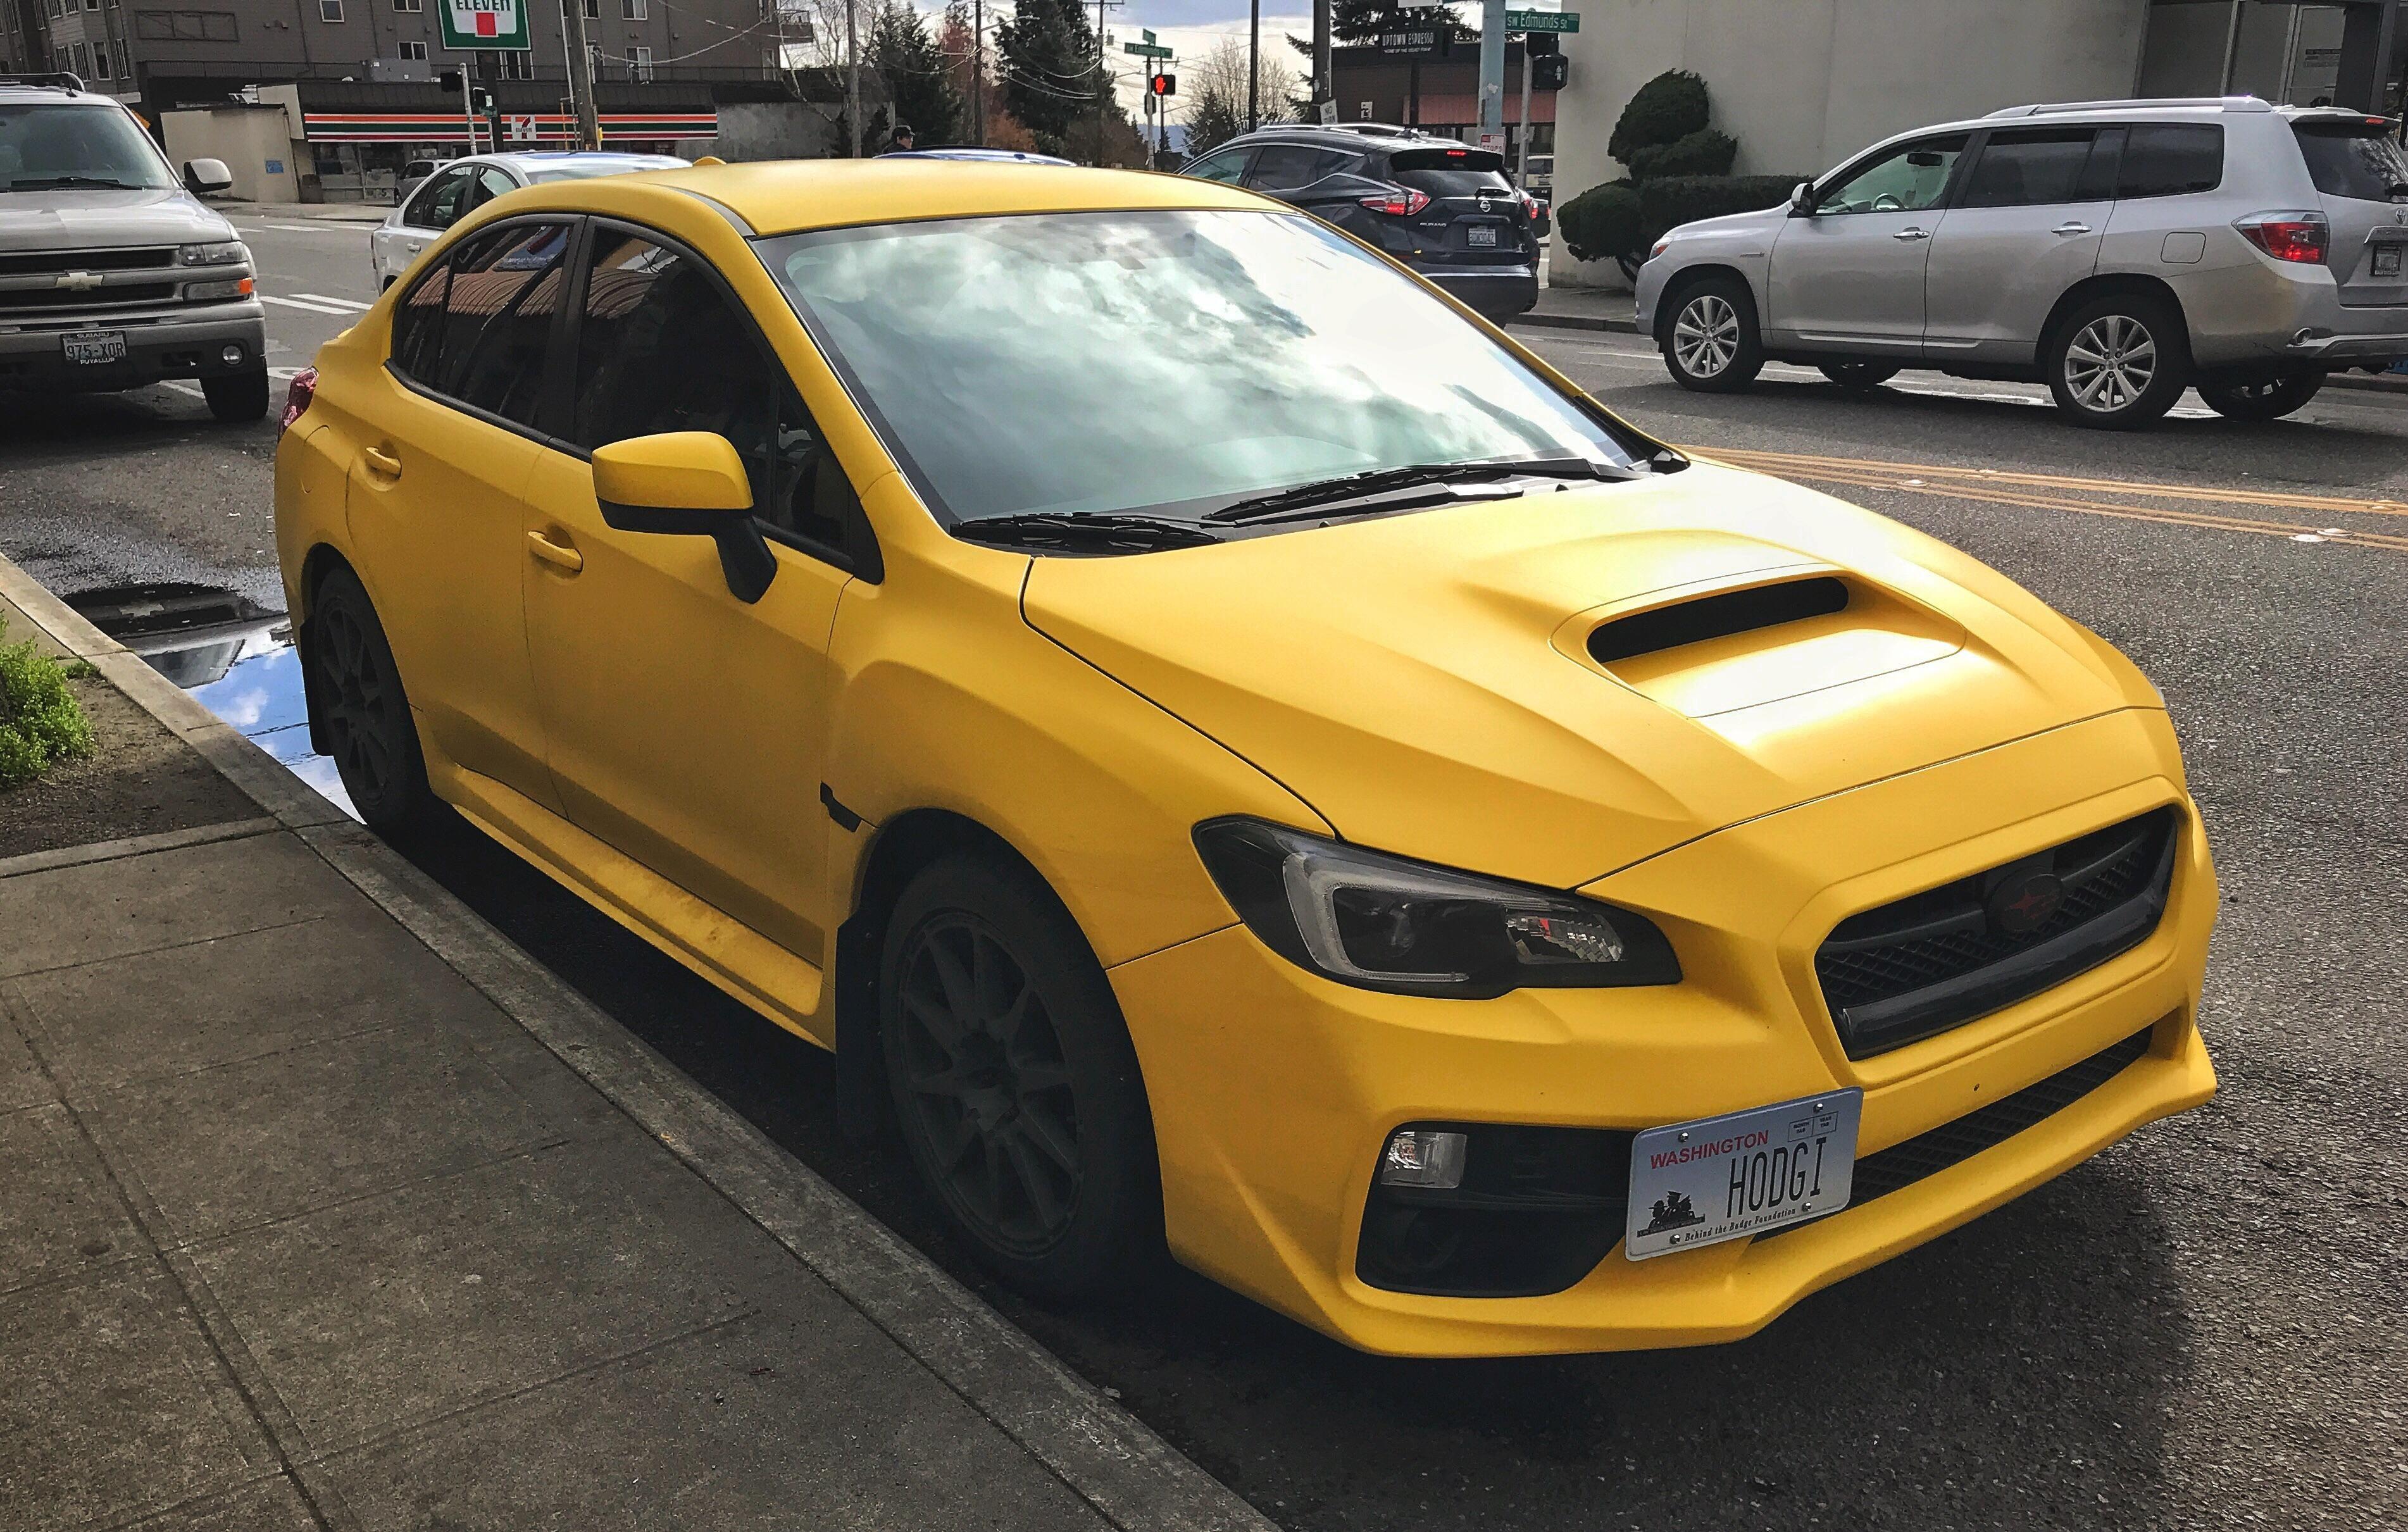 Spotted A Wrx With A Yellow Wrap In W Seattle Subaru Wrx Sti Impreza Forester Subie Wrx Subaru Spotted